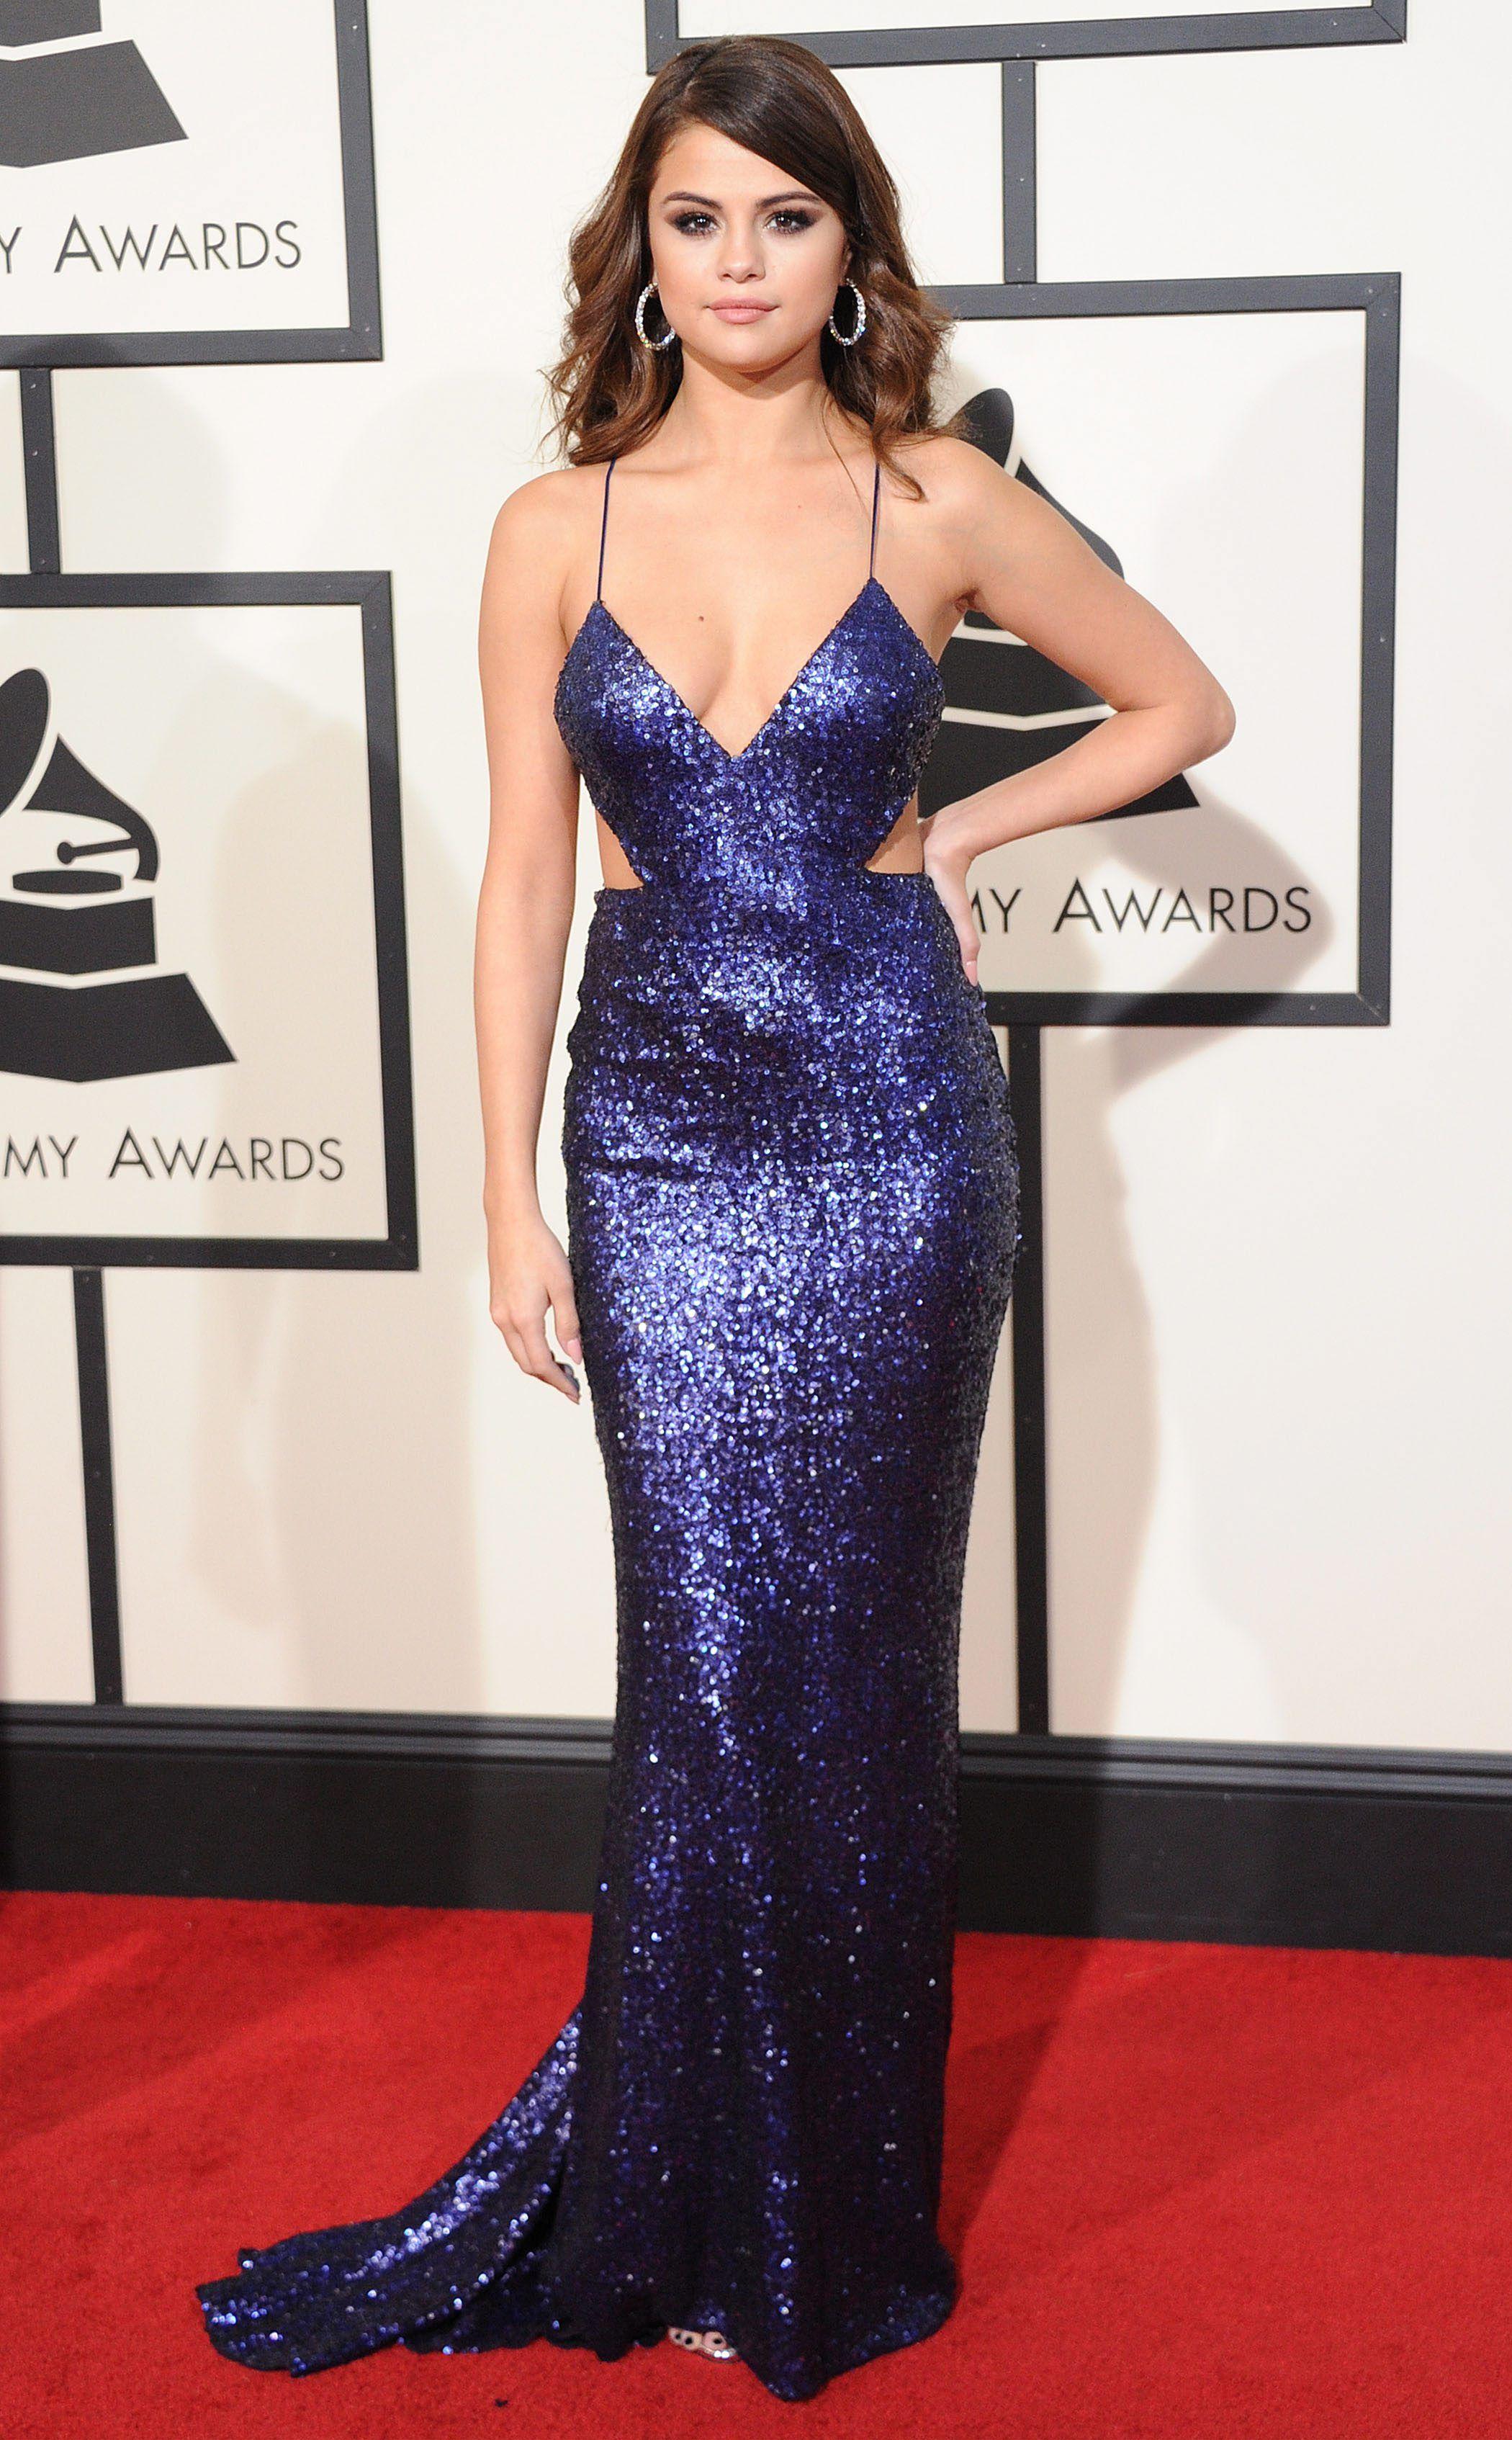 Grammys 2016: 5 Best Dressed Stars - Fame10